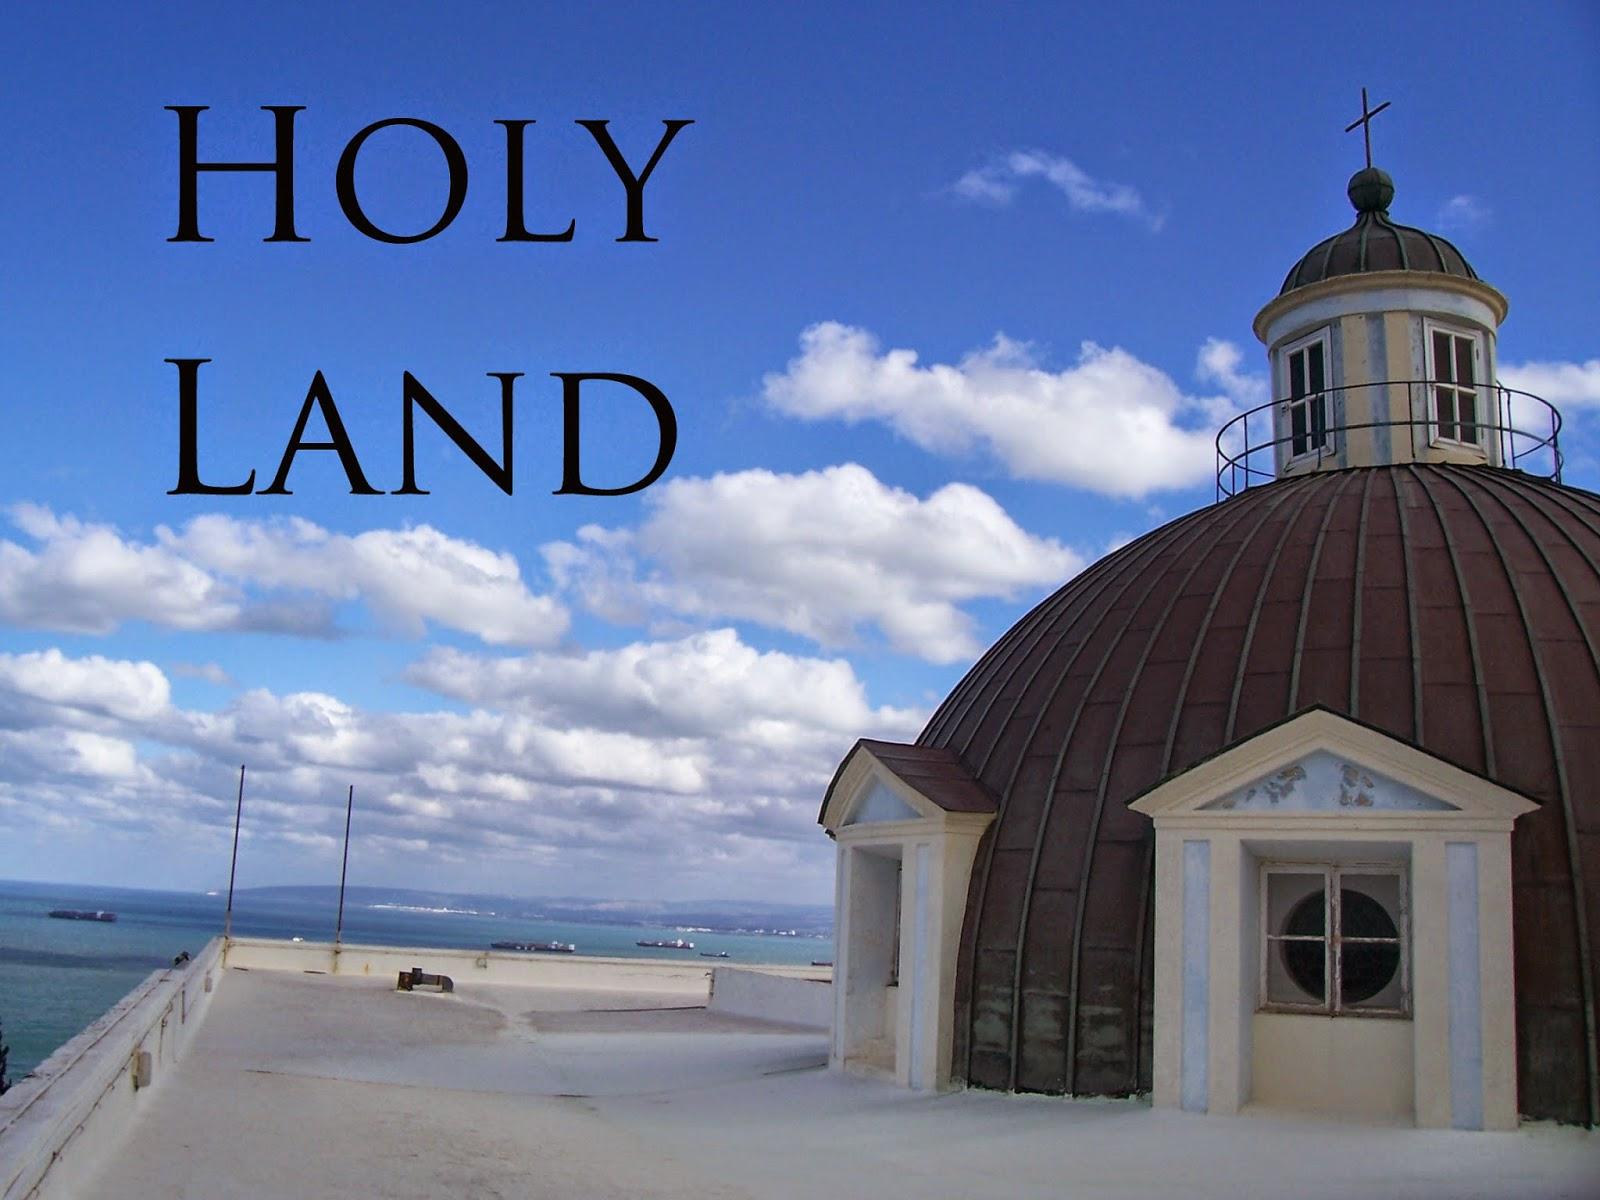 Orbis Catholicus Secundus: 2016 Holy Land Pilgrimage